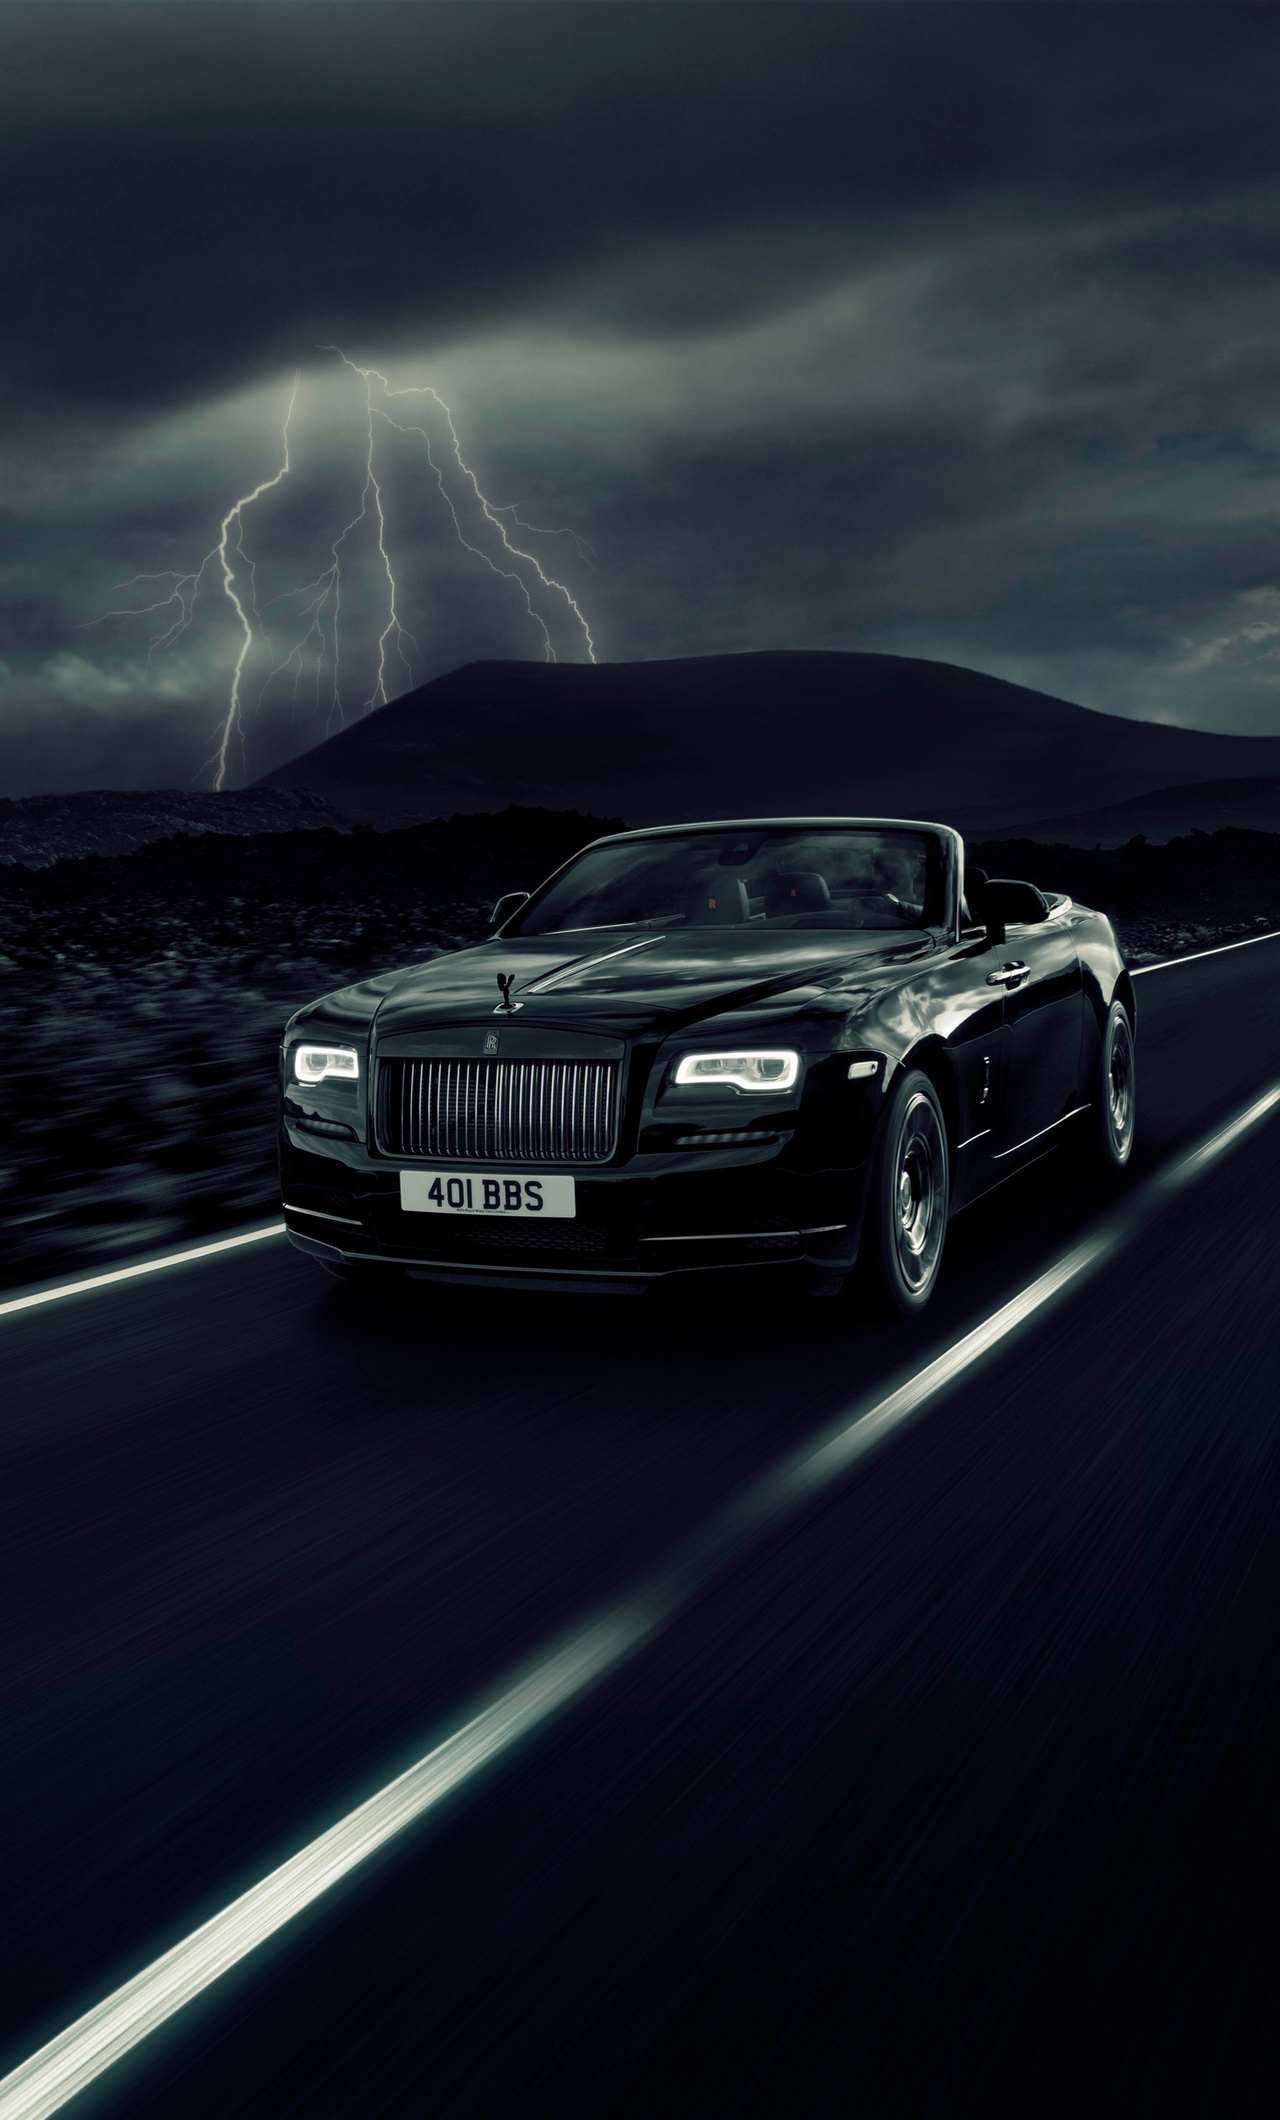 1280x2120 2017 Rolls Royce Dawn Black Badge Iphone 6 Hd 4k